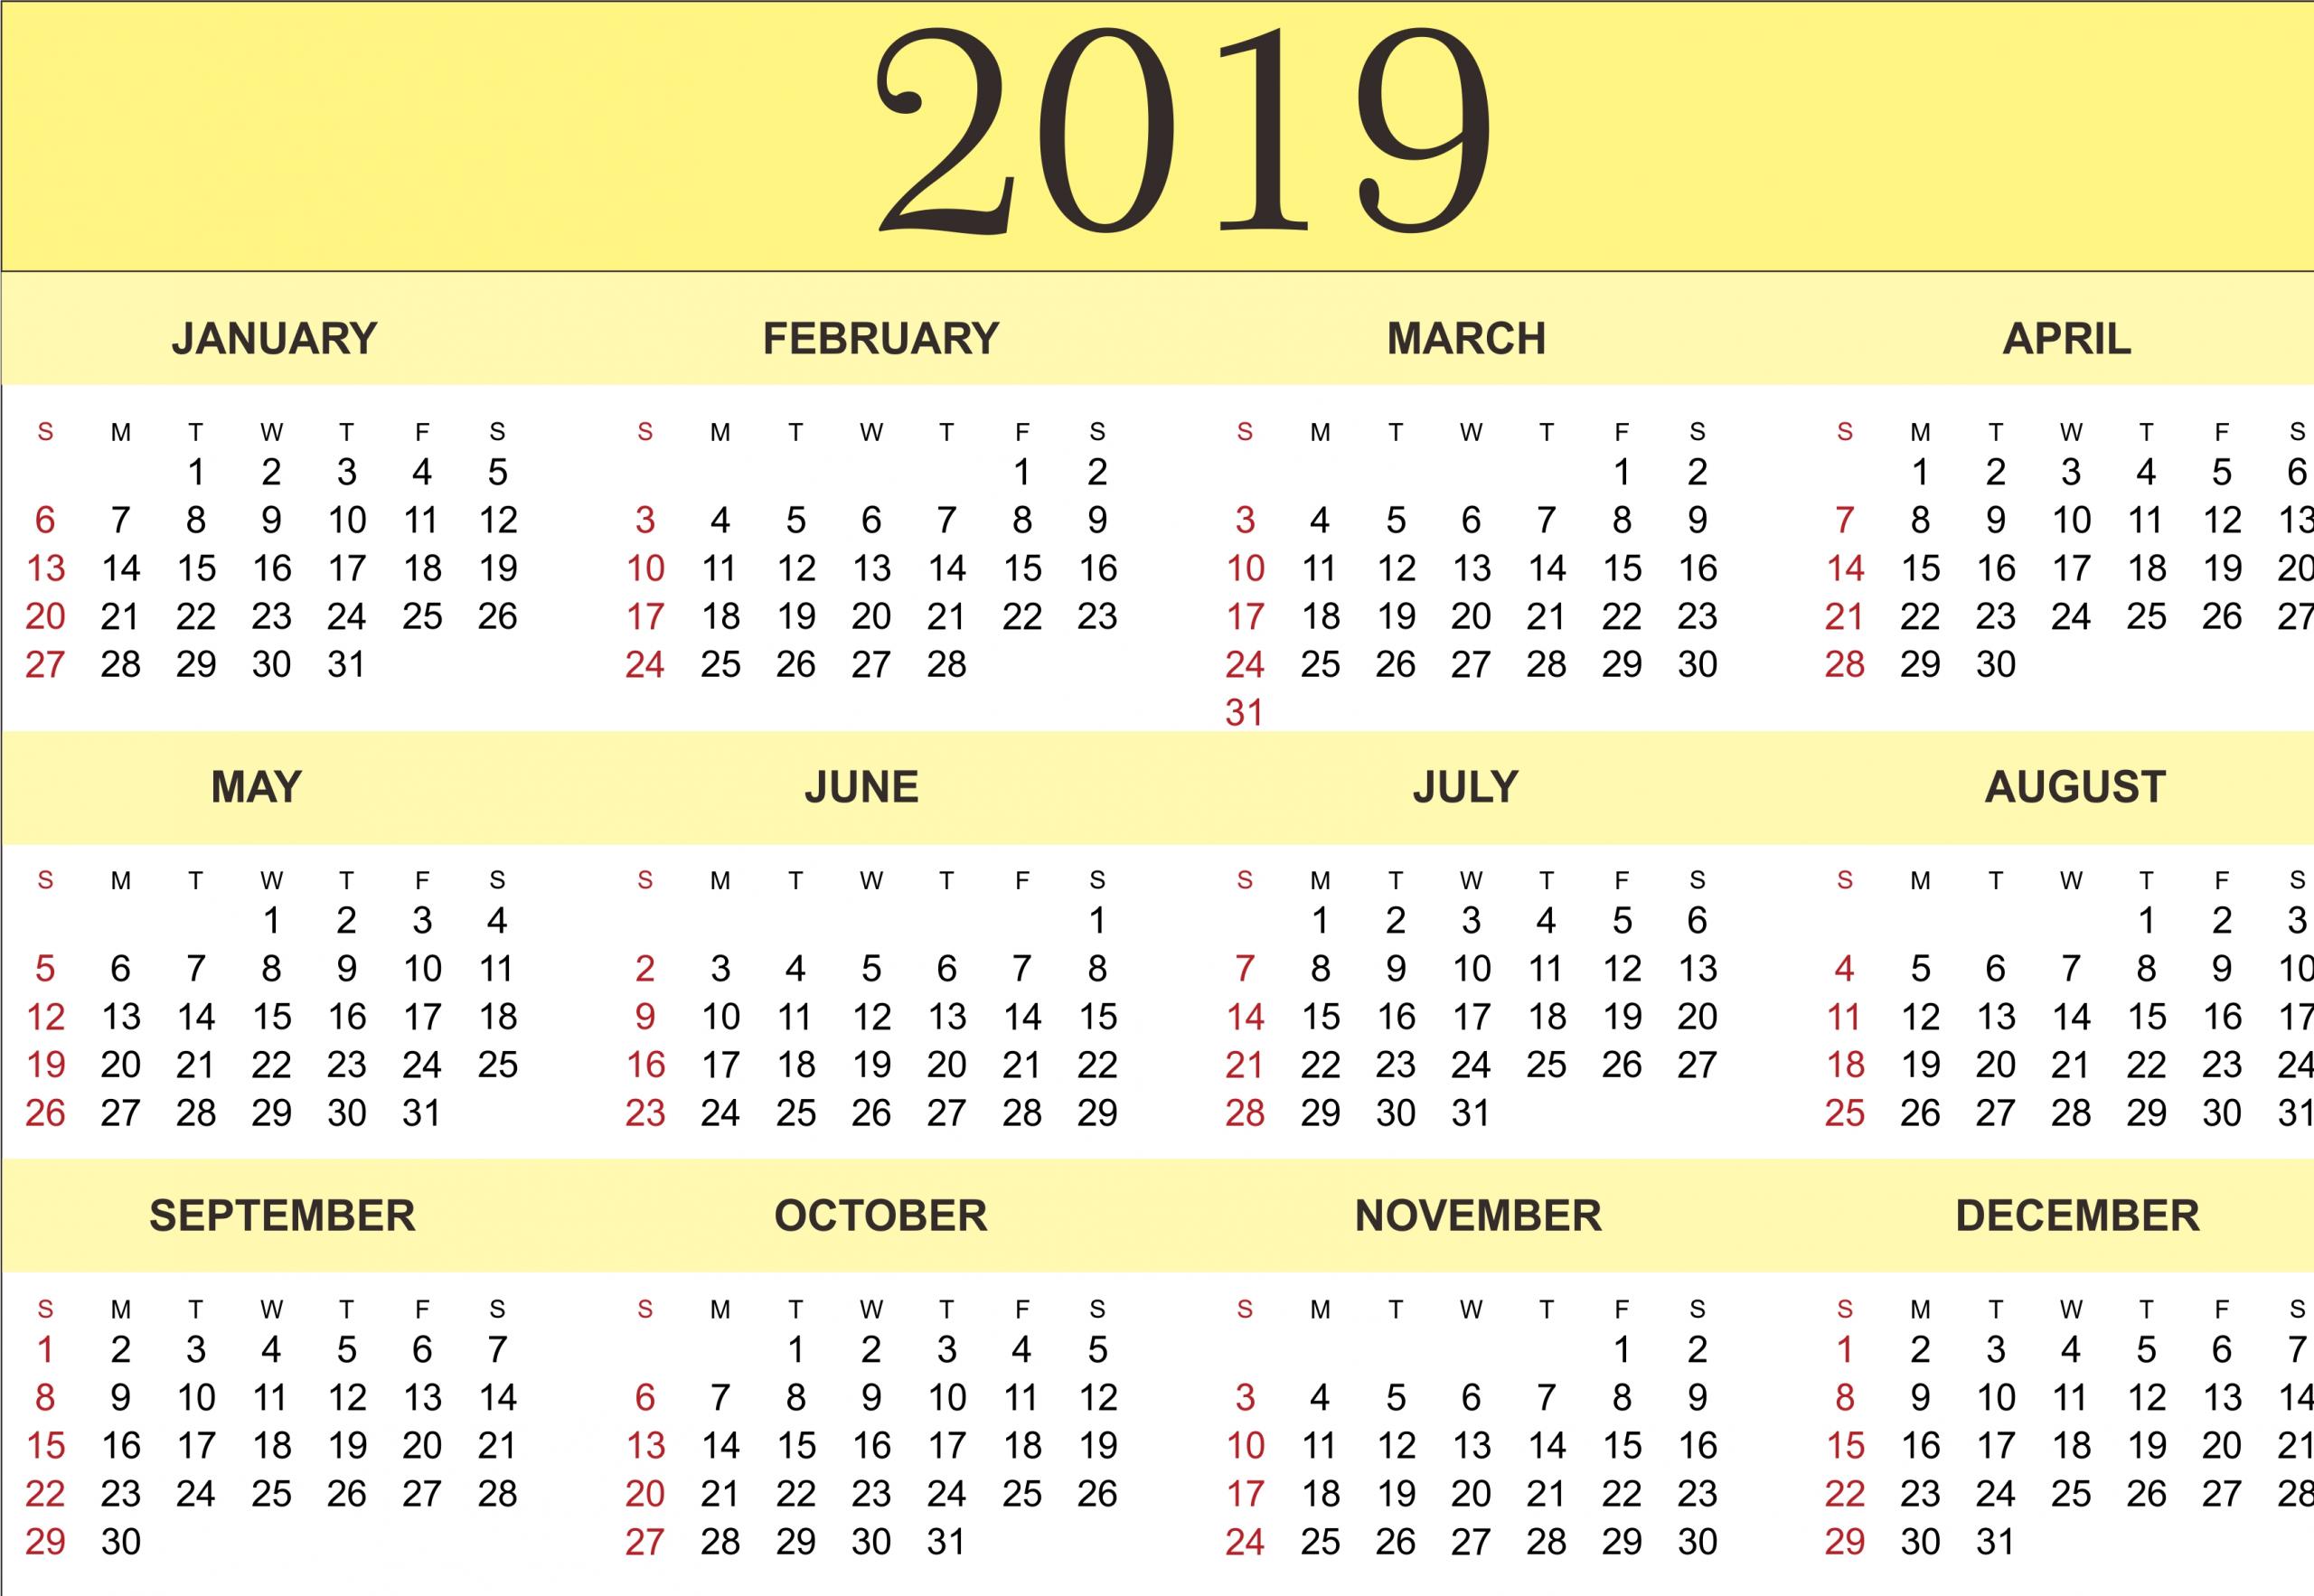 Free Yearly Calendar 2019 - Printable Blank Templates